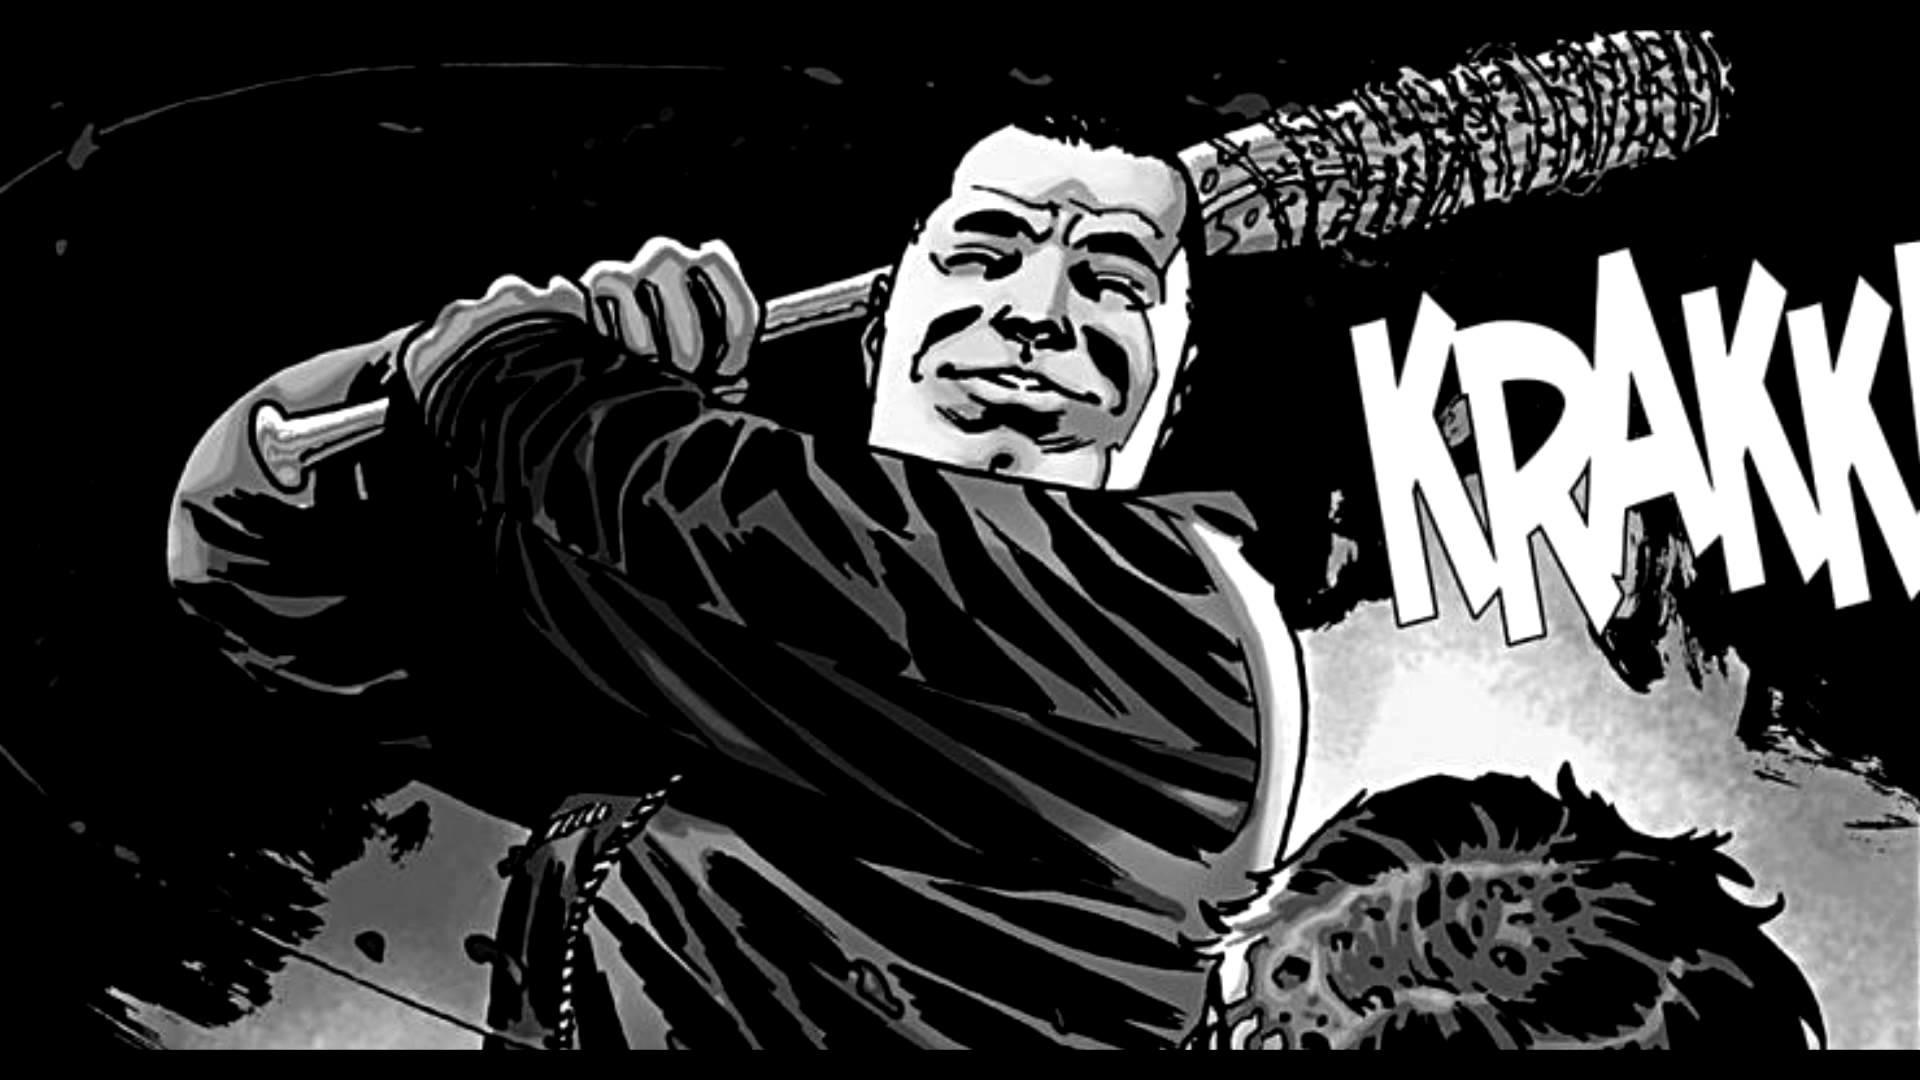 The Walking Dead Negan Wallpaper: Walking Dead Comic Wallpaper (66+ Pictures